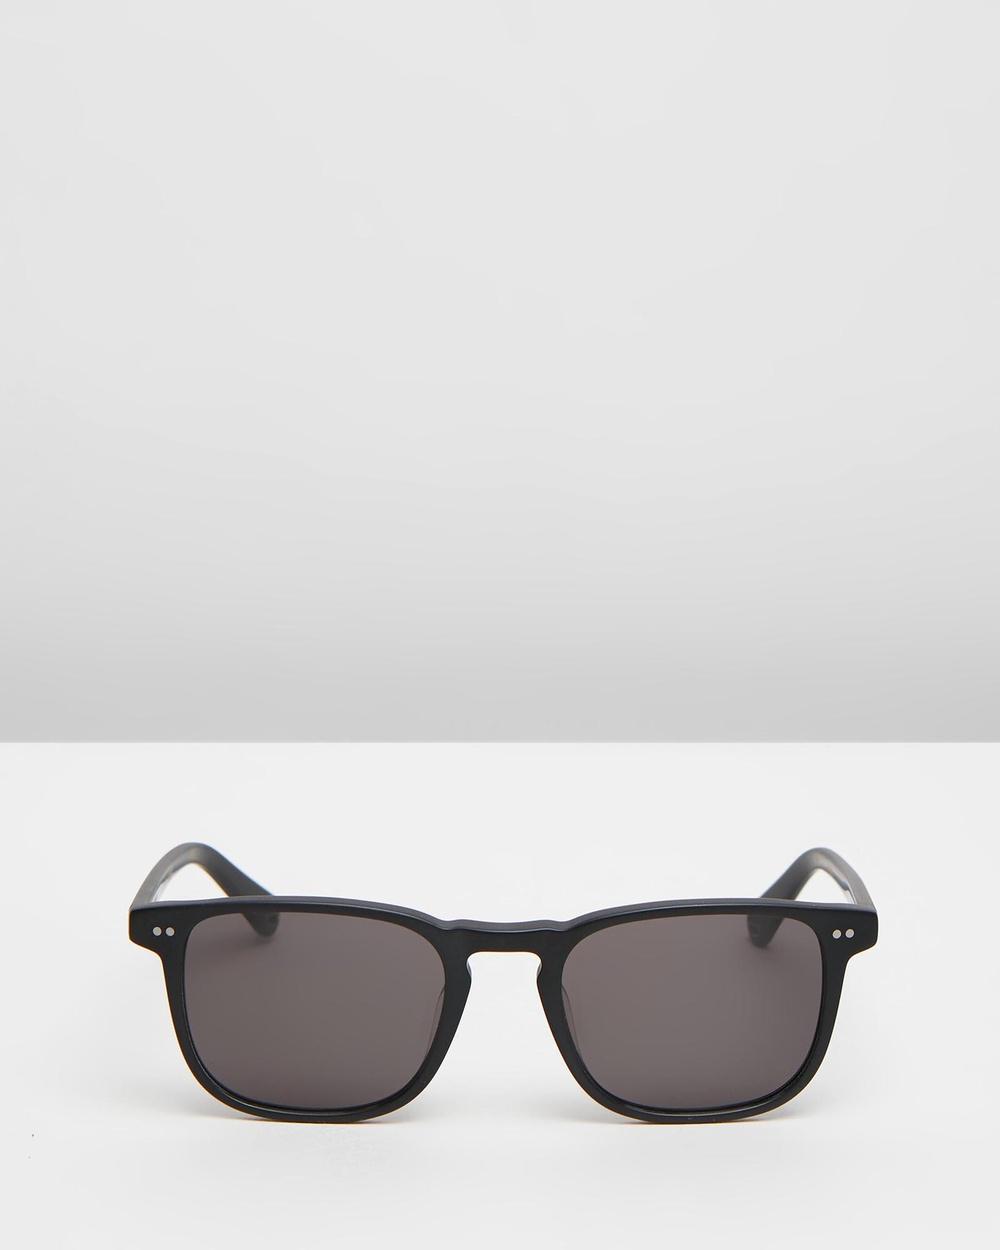 Pacifico Optical Blair Square Matte Black with Polarised Grey lens